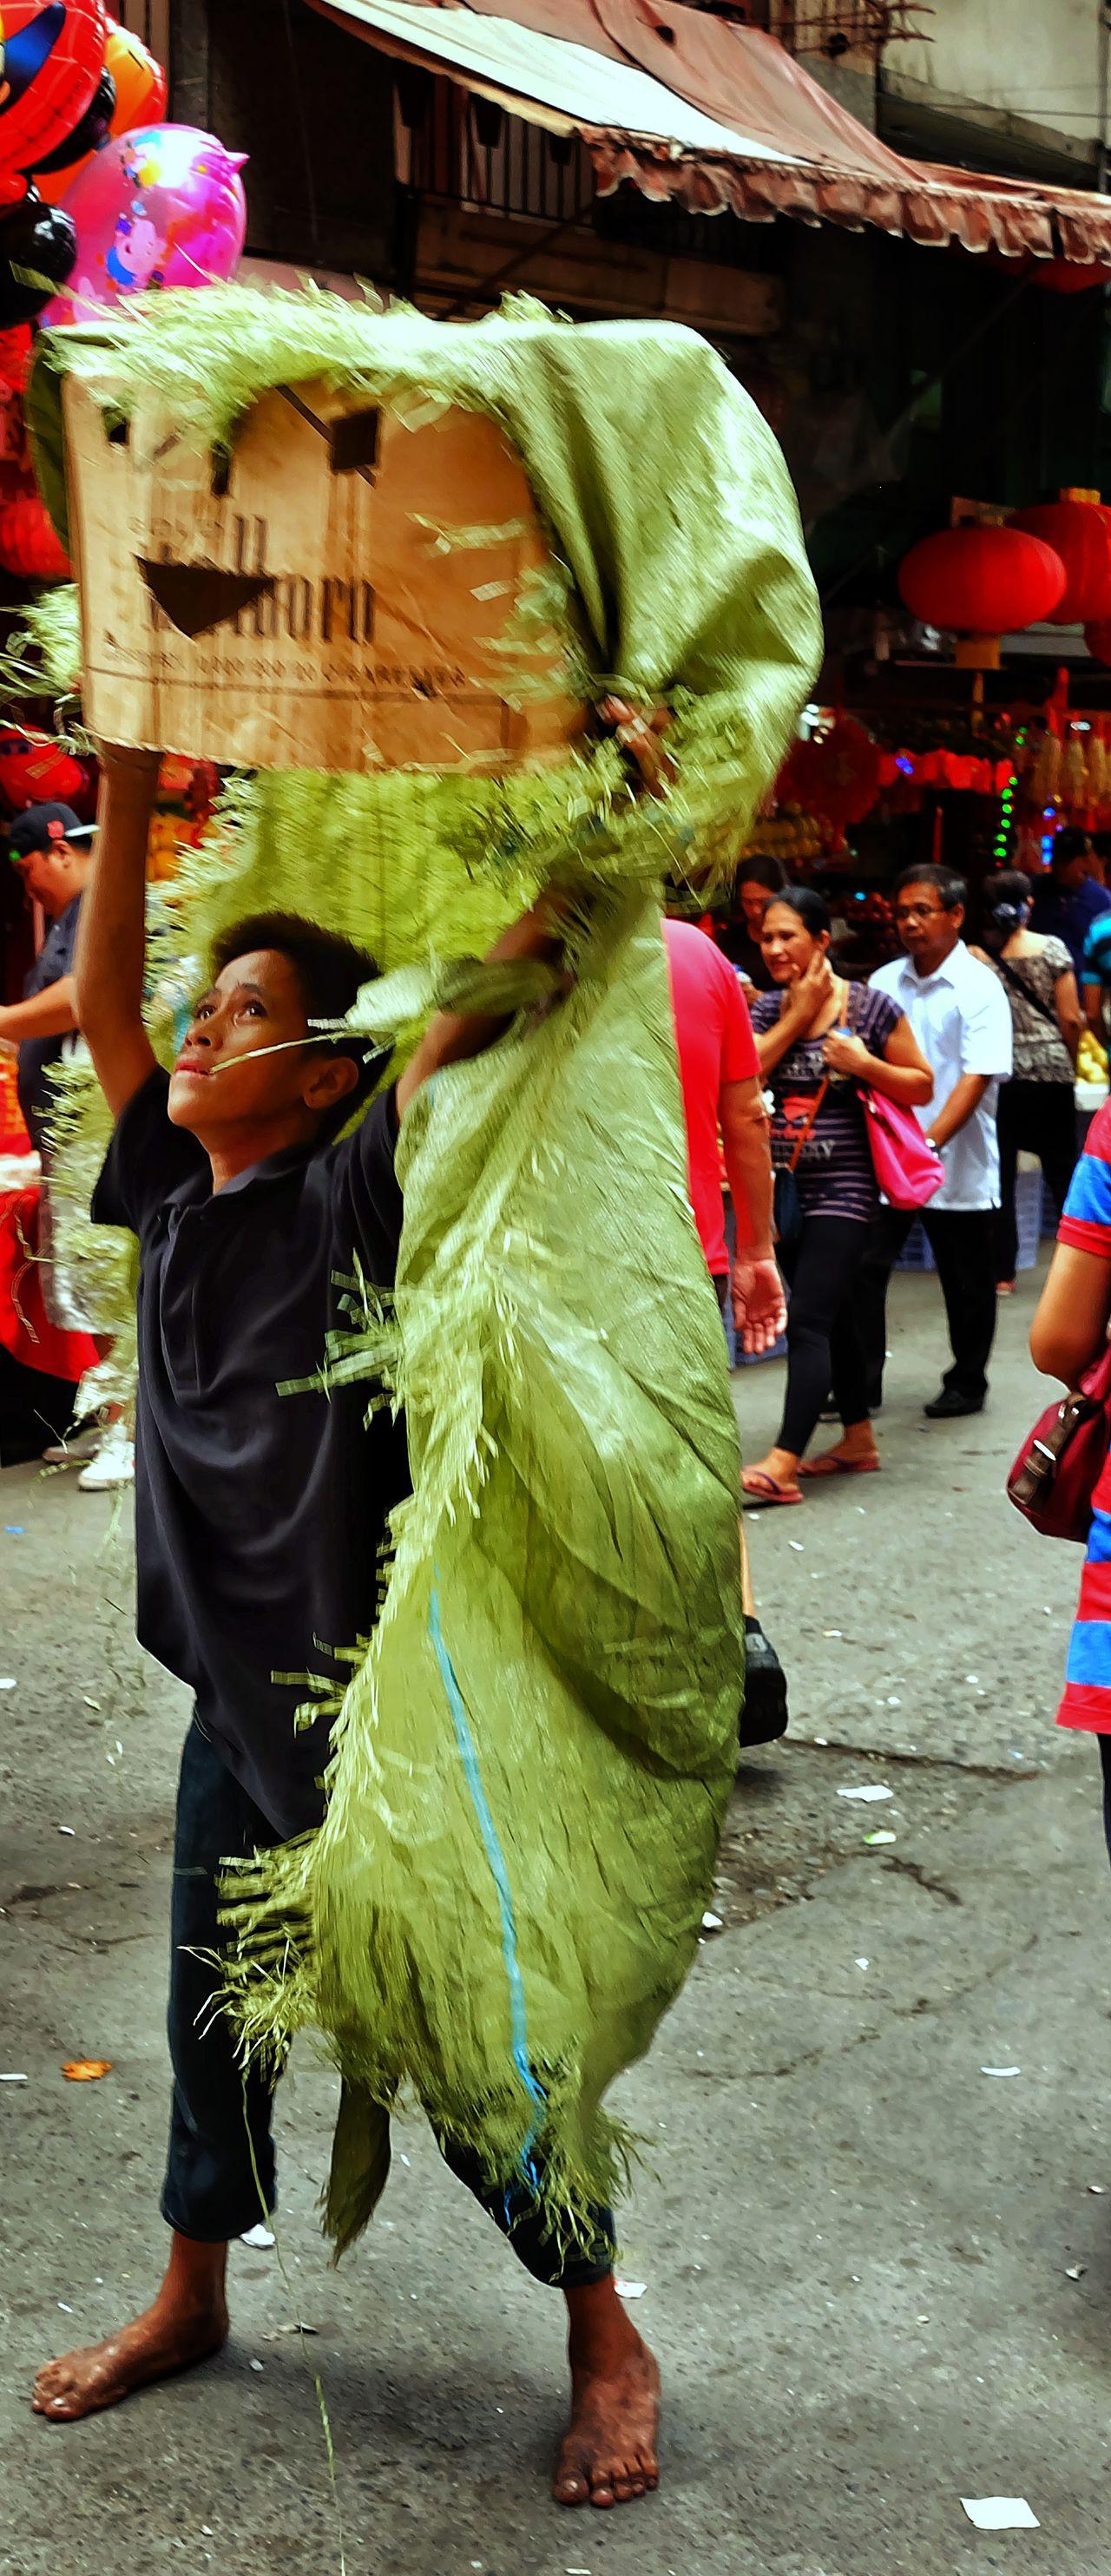 EyeEm Taking Photos XA1 Eyeem Philippines Fujifilm X-a1 2017 Fujifilm EyeEm Best Edits EyeEm Vision Fujifilm_xseries Check This Out CNY2017 Chinesnewyear Liondance Binondo Ongpin Kid Philippines Resourceful Resourcefulness